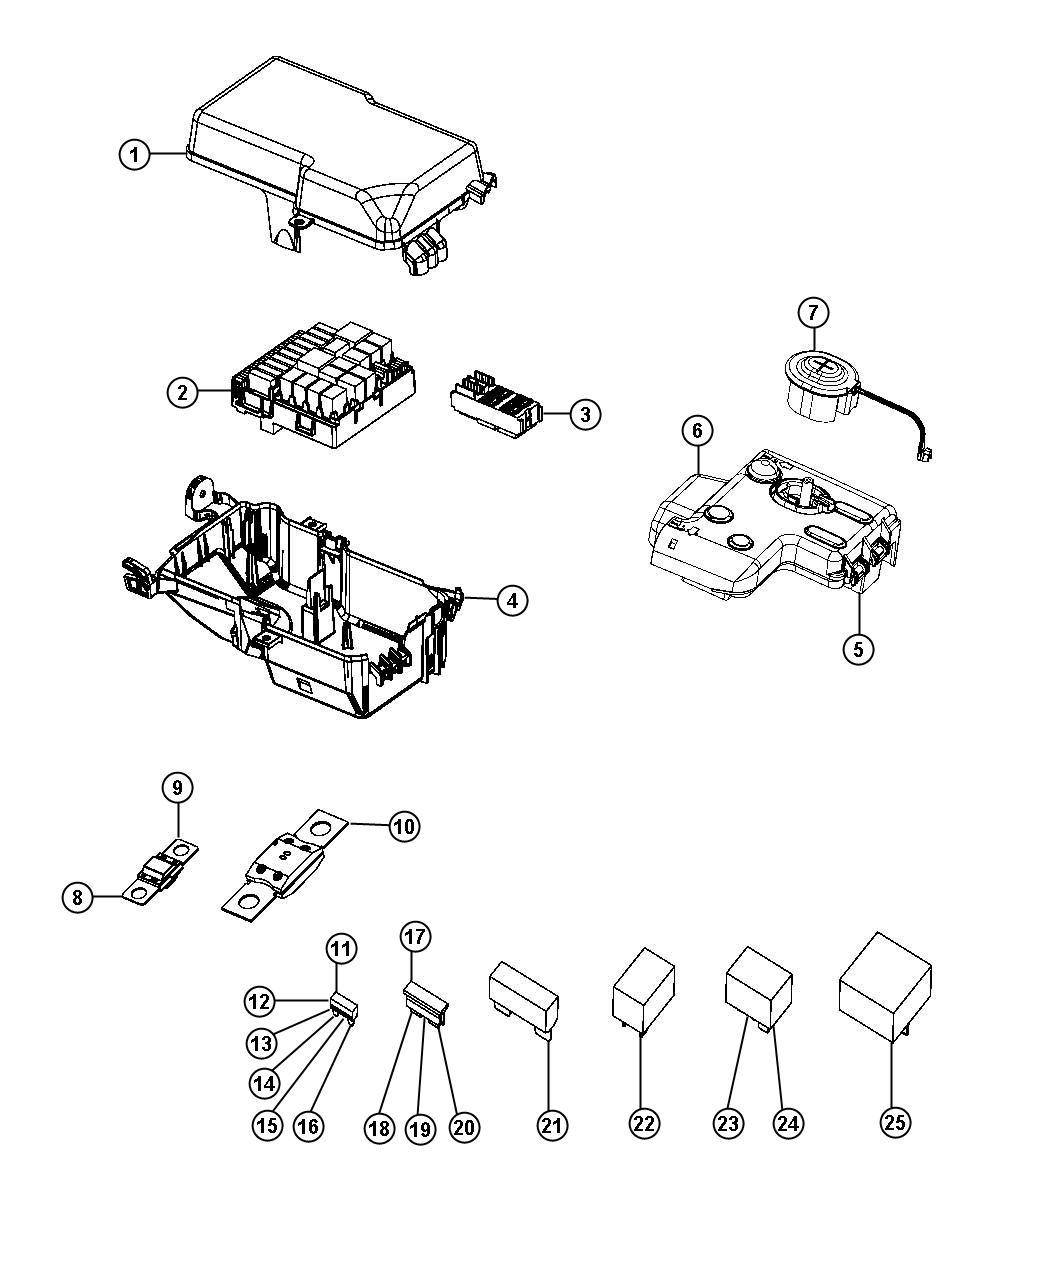 Wiring Diagram 34 Dodge Dart Fuse Box Diagram